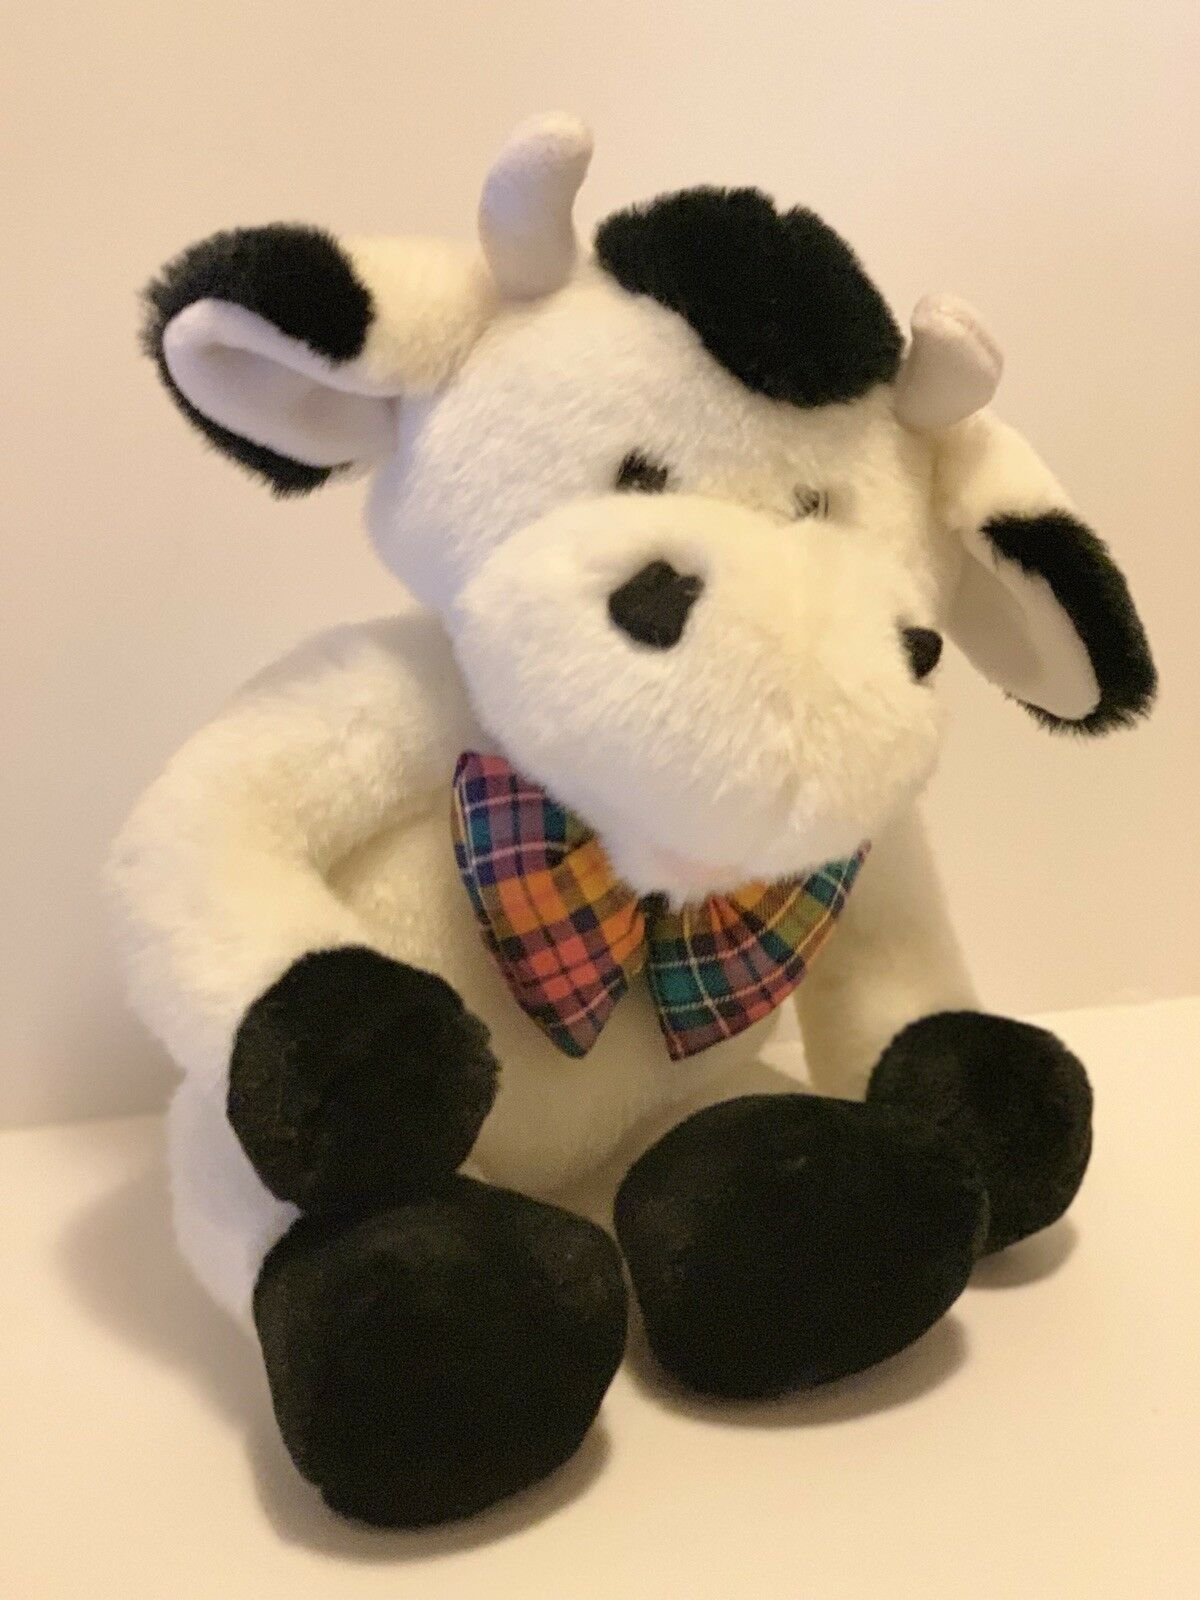 "Commonwealth Plush Cow Black White Stuffed Animal Plaid Bow Tie Soft 14"" Toy image 4"